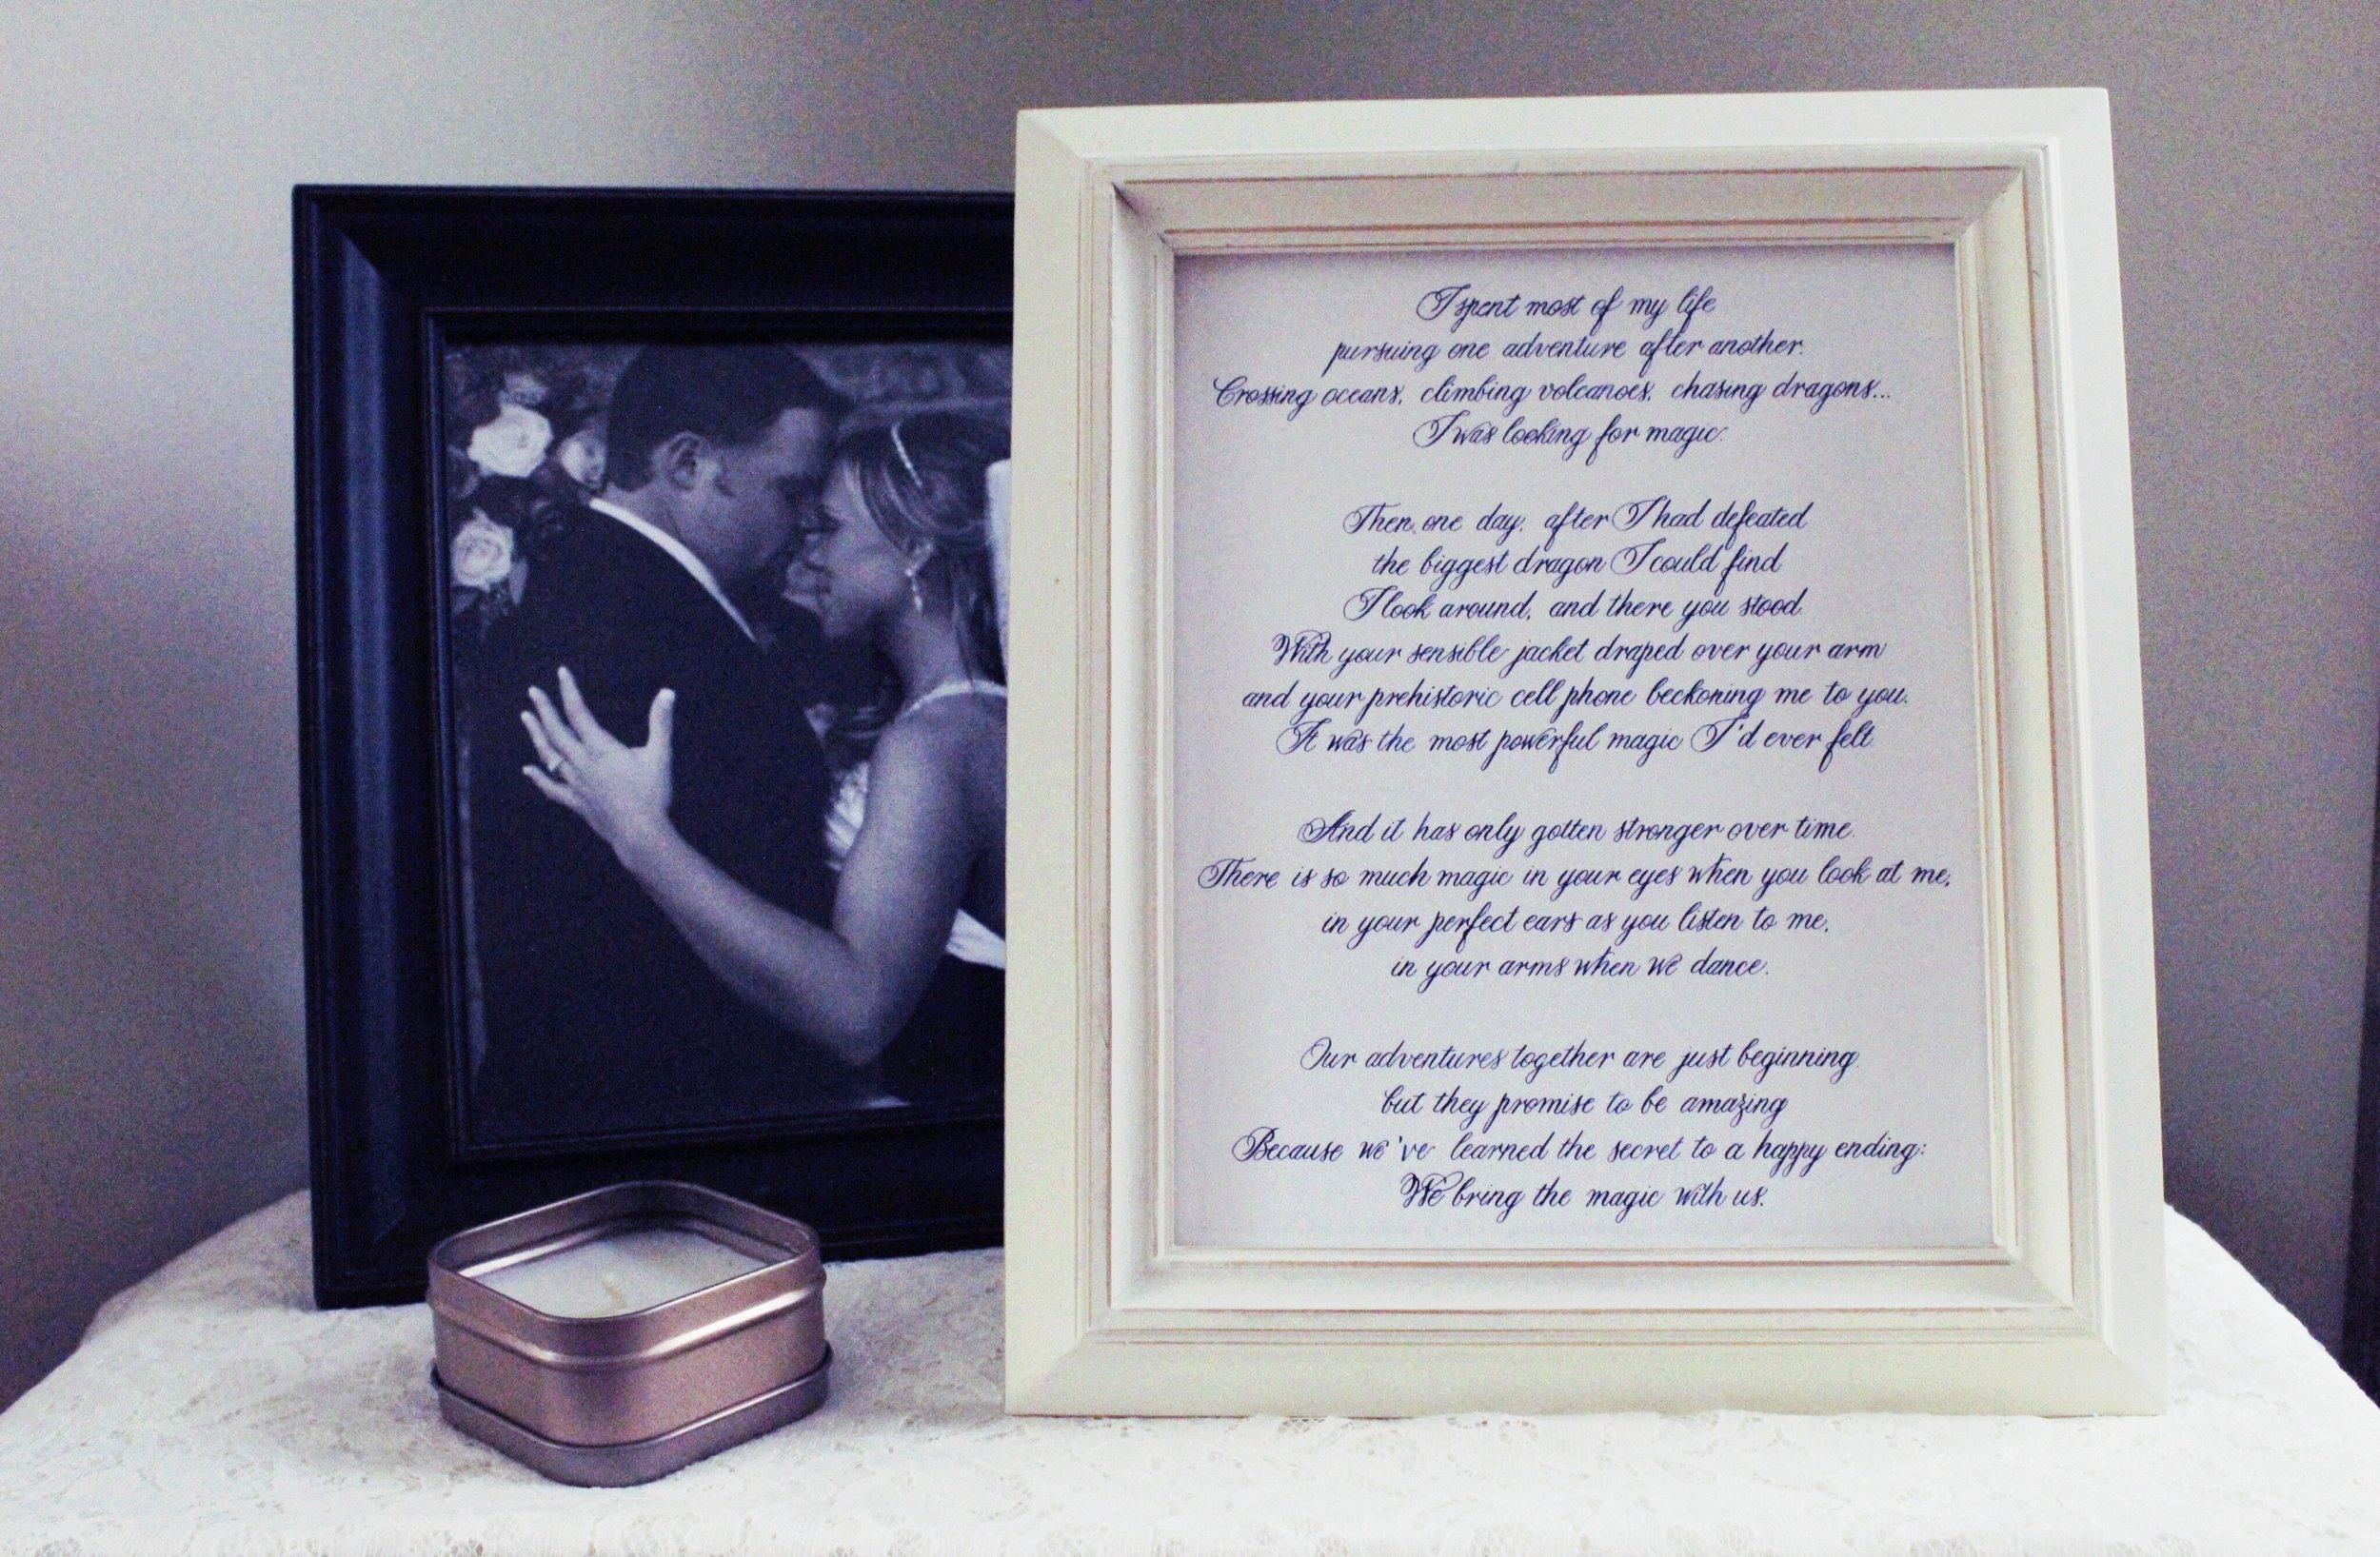 Central PA, York PA, JesSmith Designs, custom, wedding, invitations, bridal, announcements, save the date, baby, hanover, calligraphy, baltimore, wedding invitations, lancaster, gettysburg-05-10 05.00.06.jpg